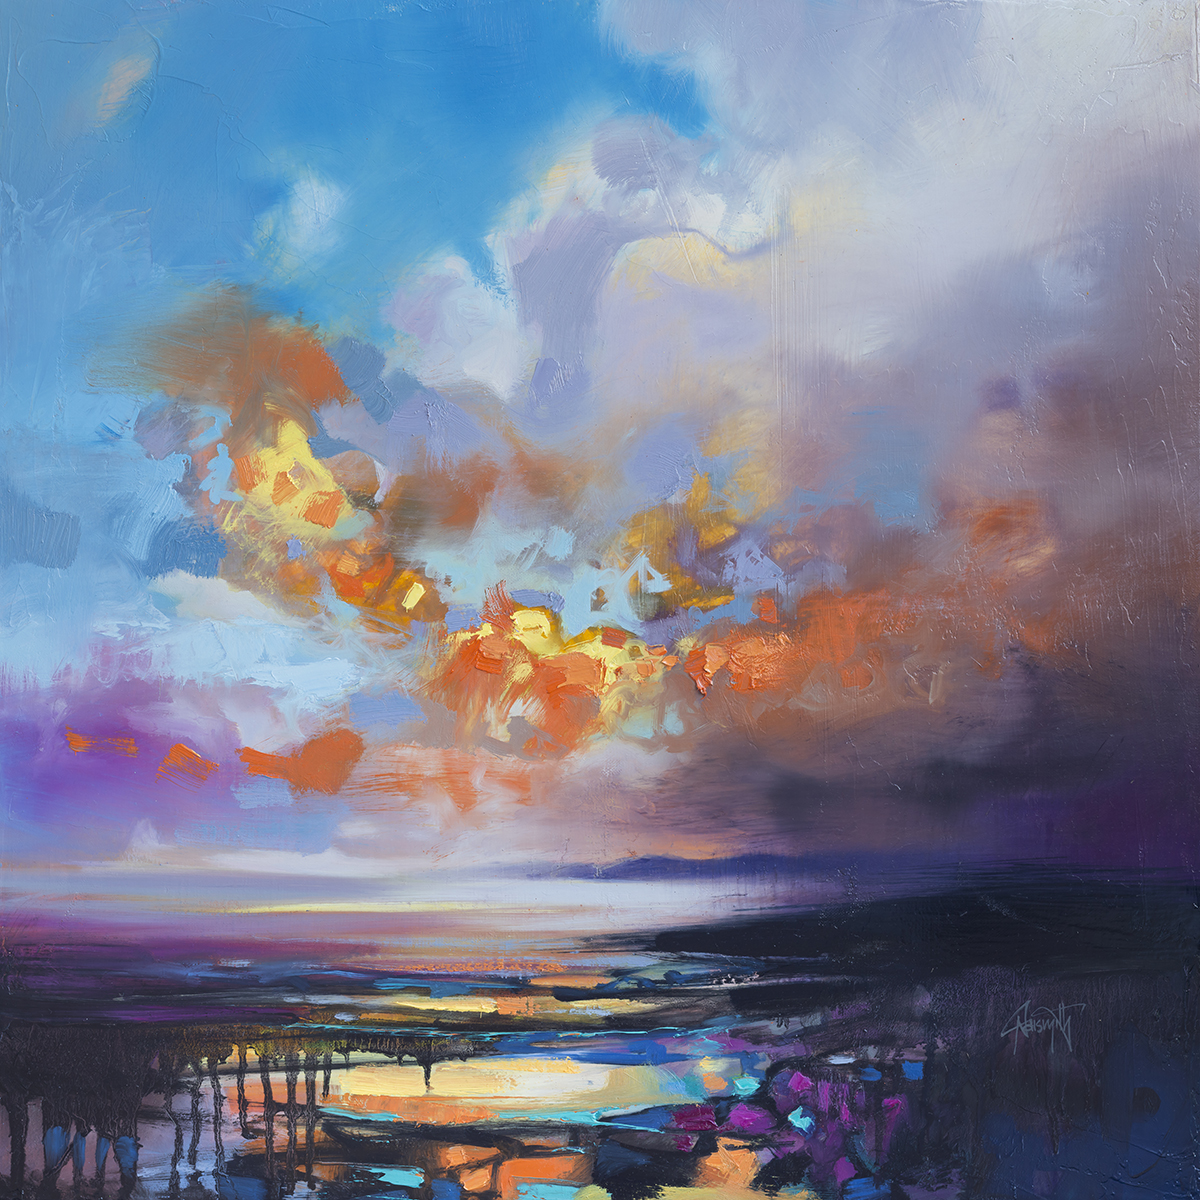 'Light From Darkness 1' | 60 x 60cm original painting